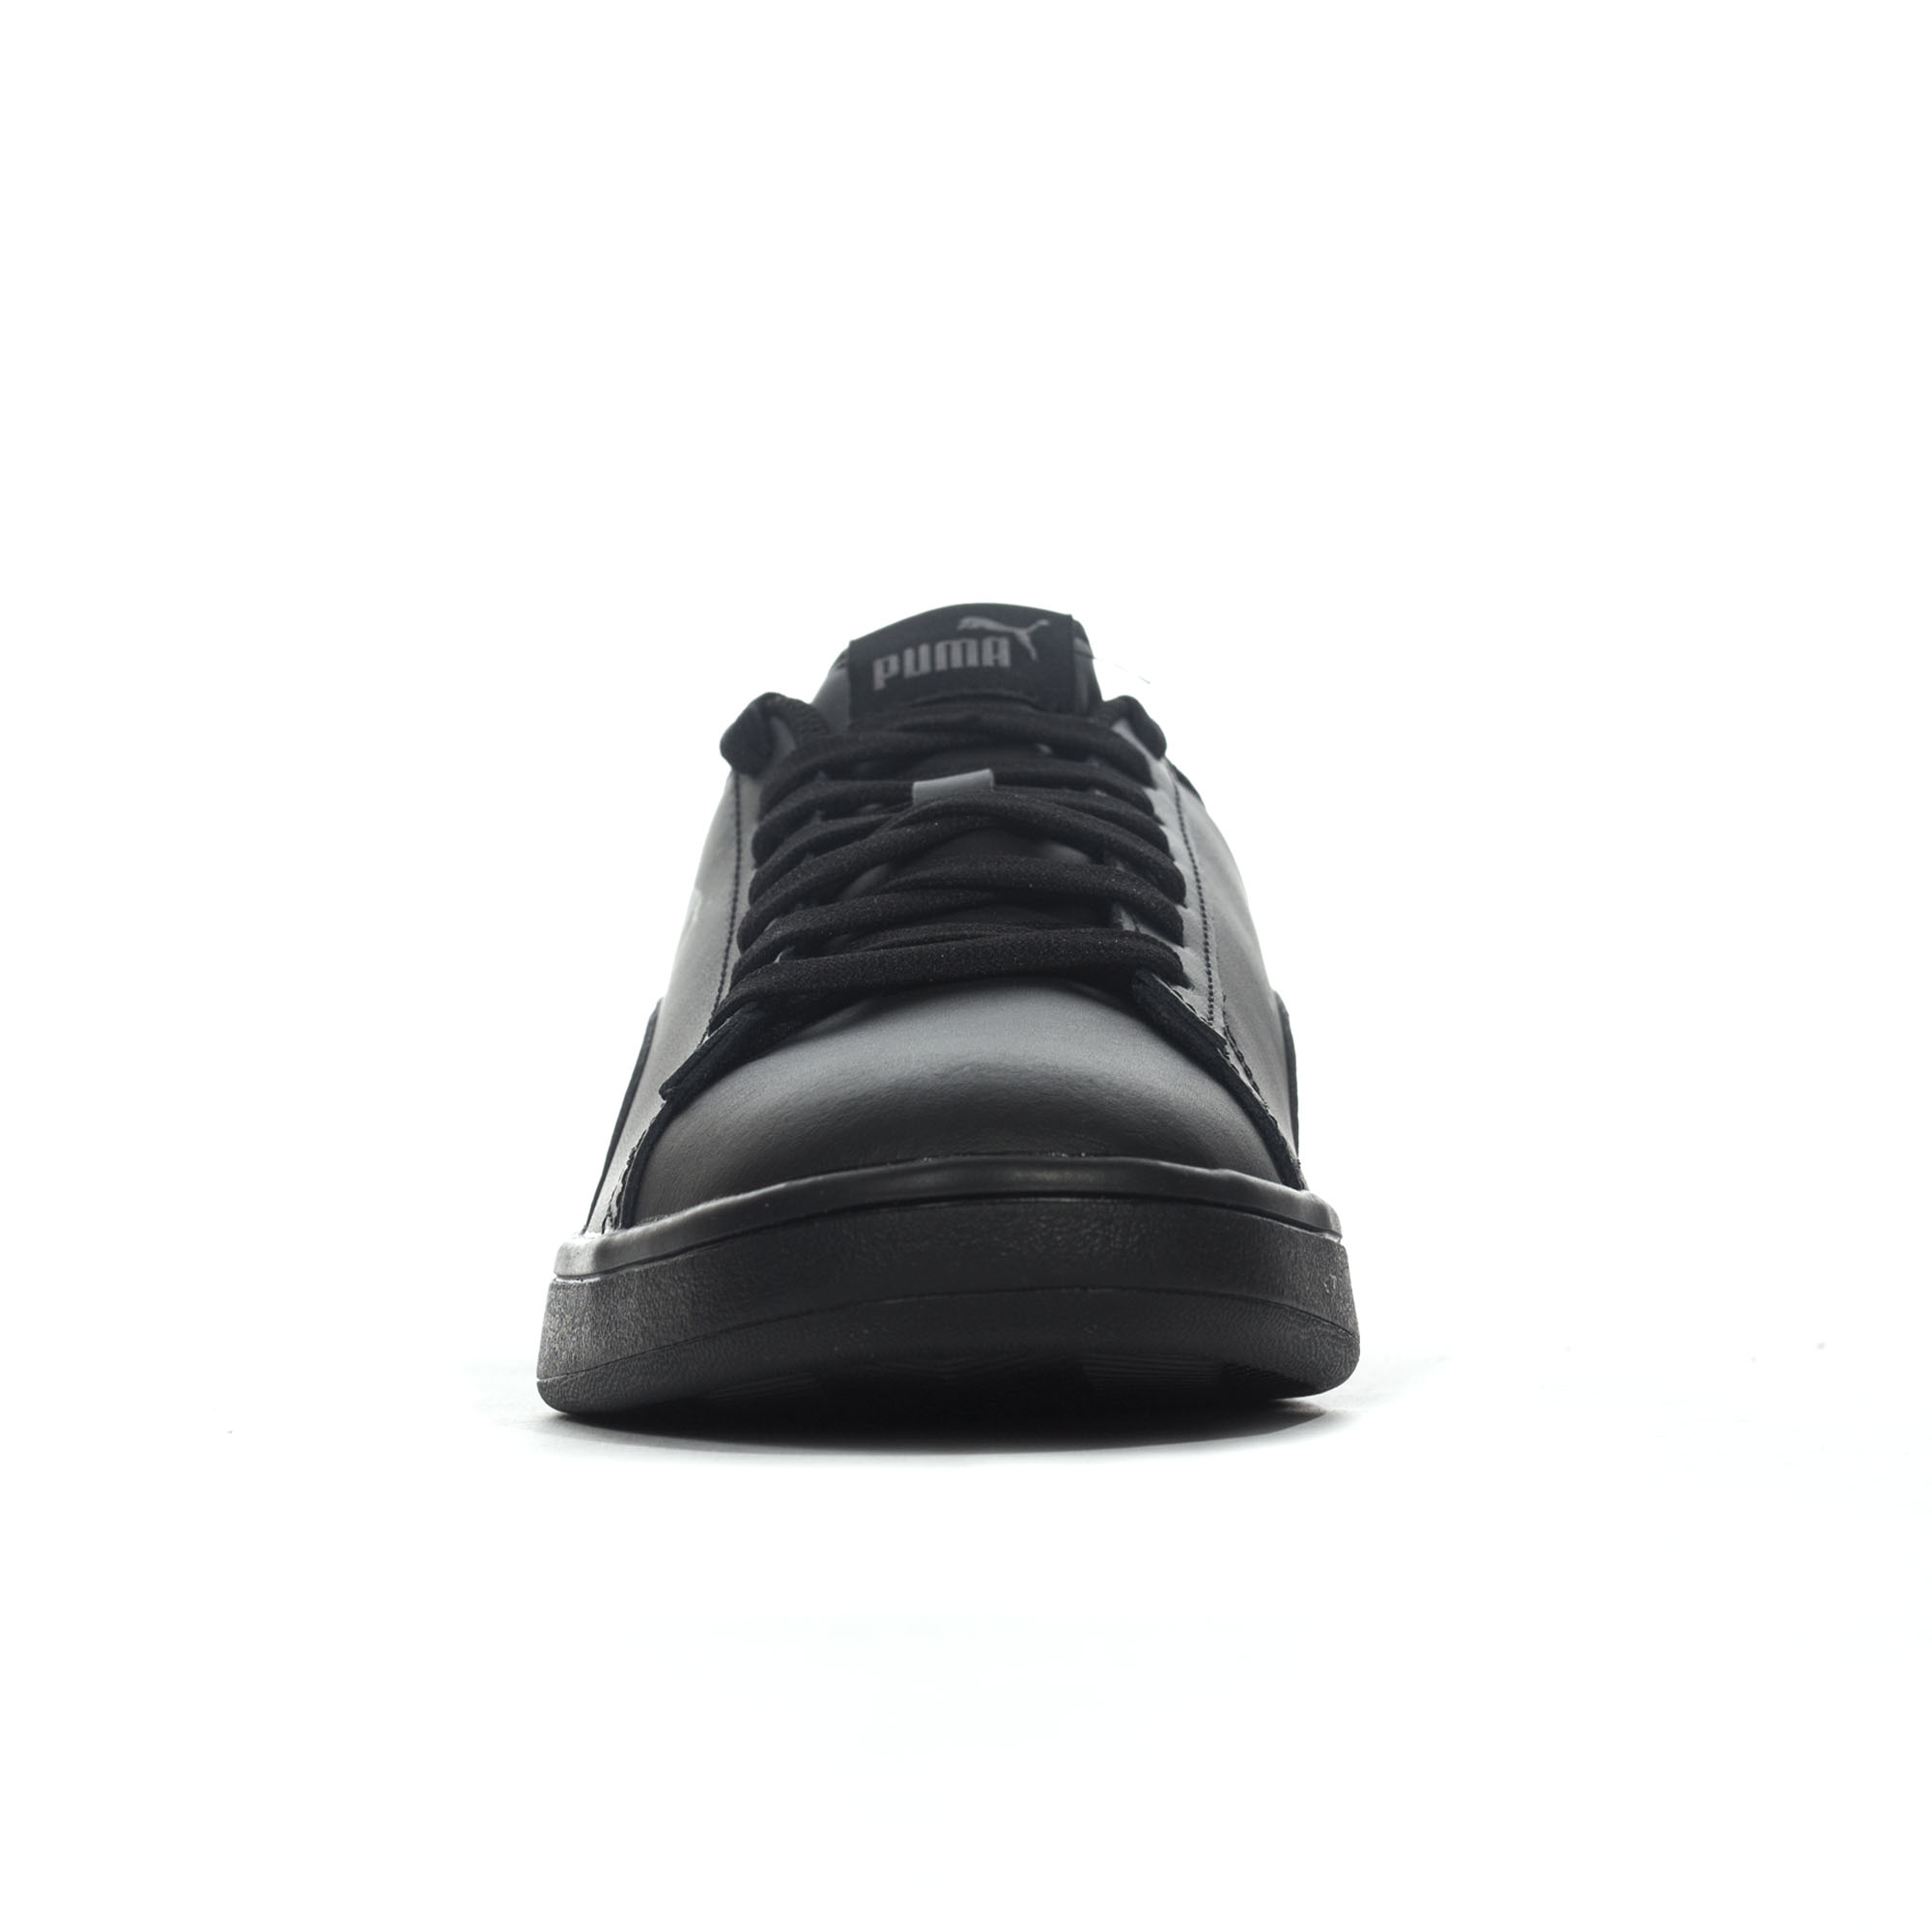 81f8a126d49c Puma Smash v2 Leather Mens Football Terrace Trainer Shoe Black - UK ...